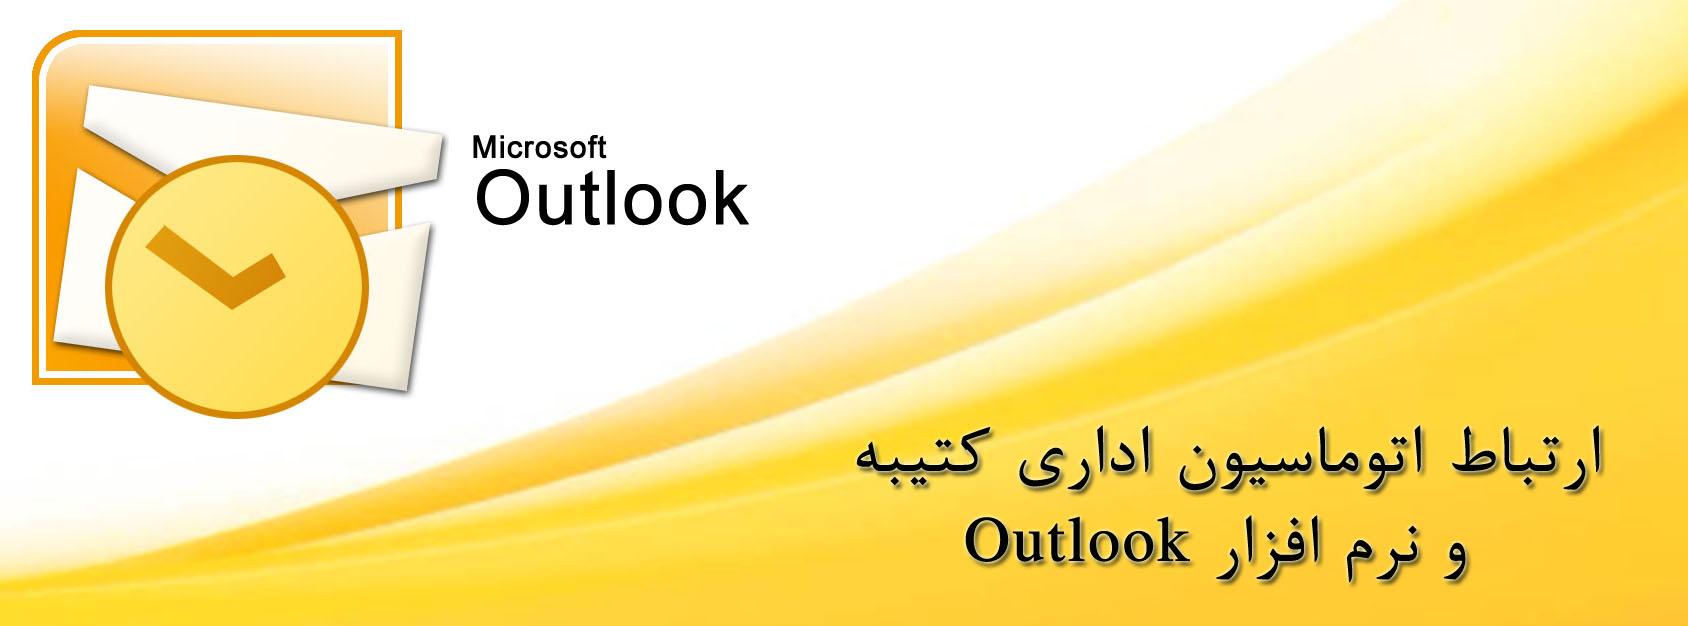 اتوماسیون اداری و Outlook